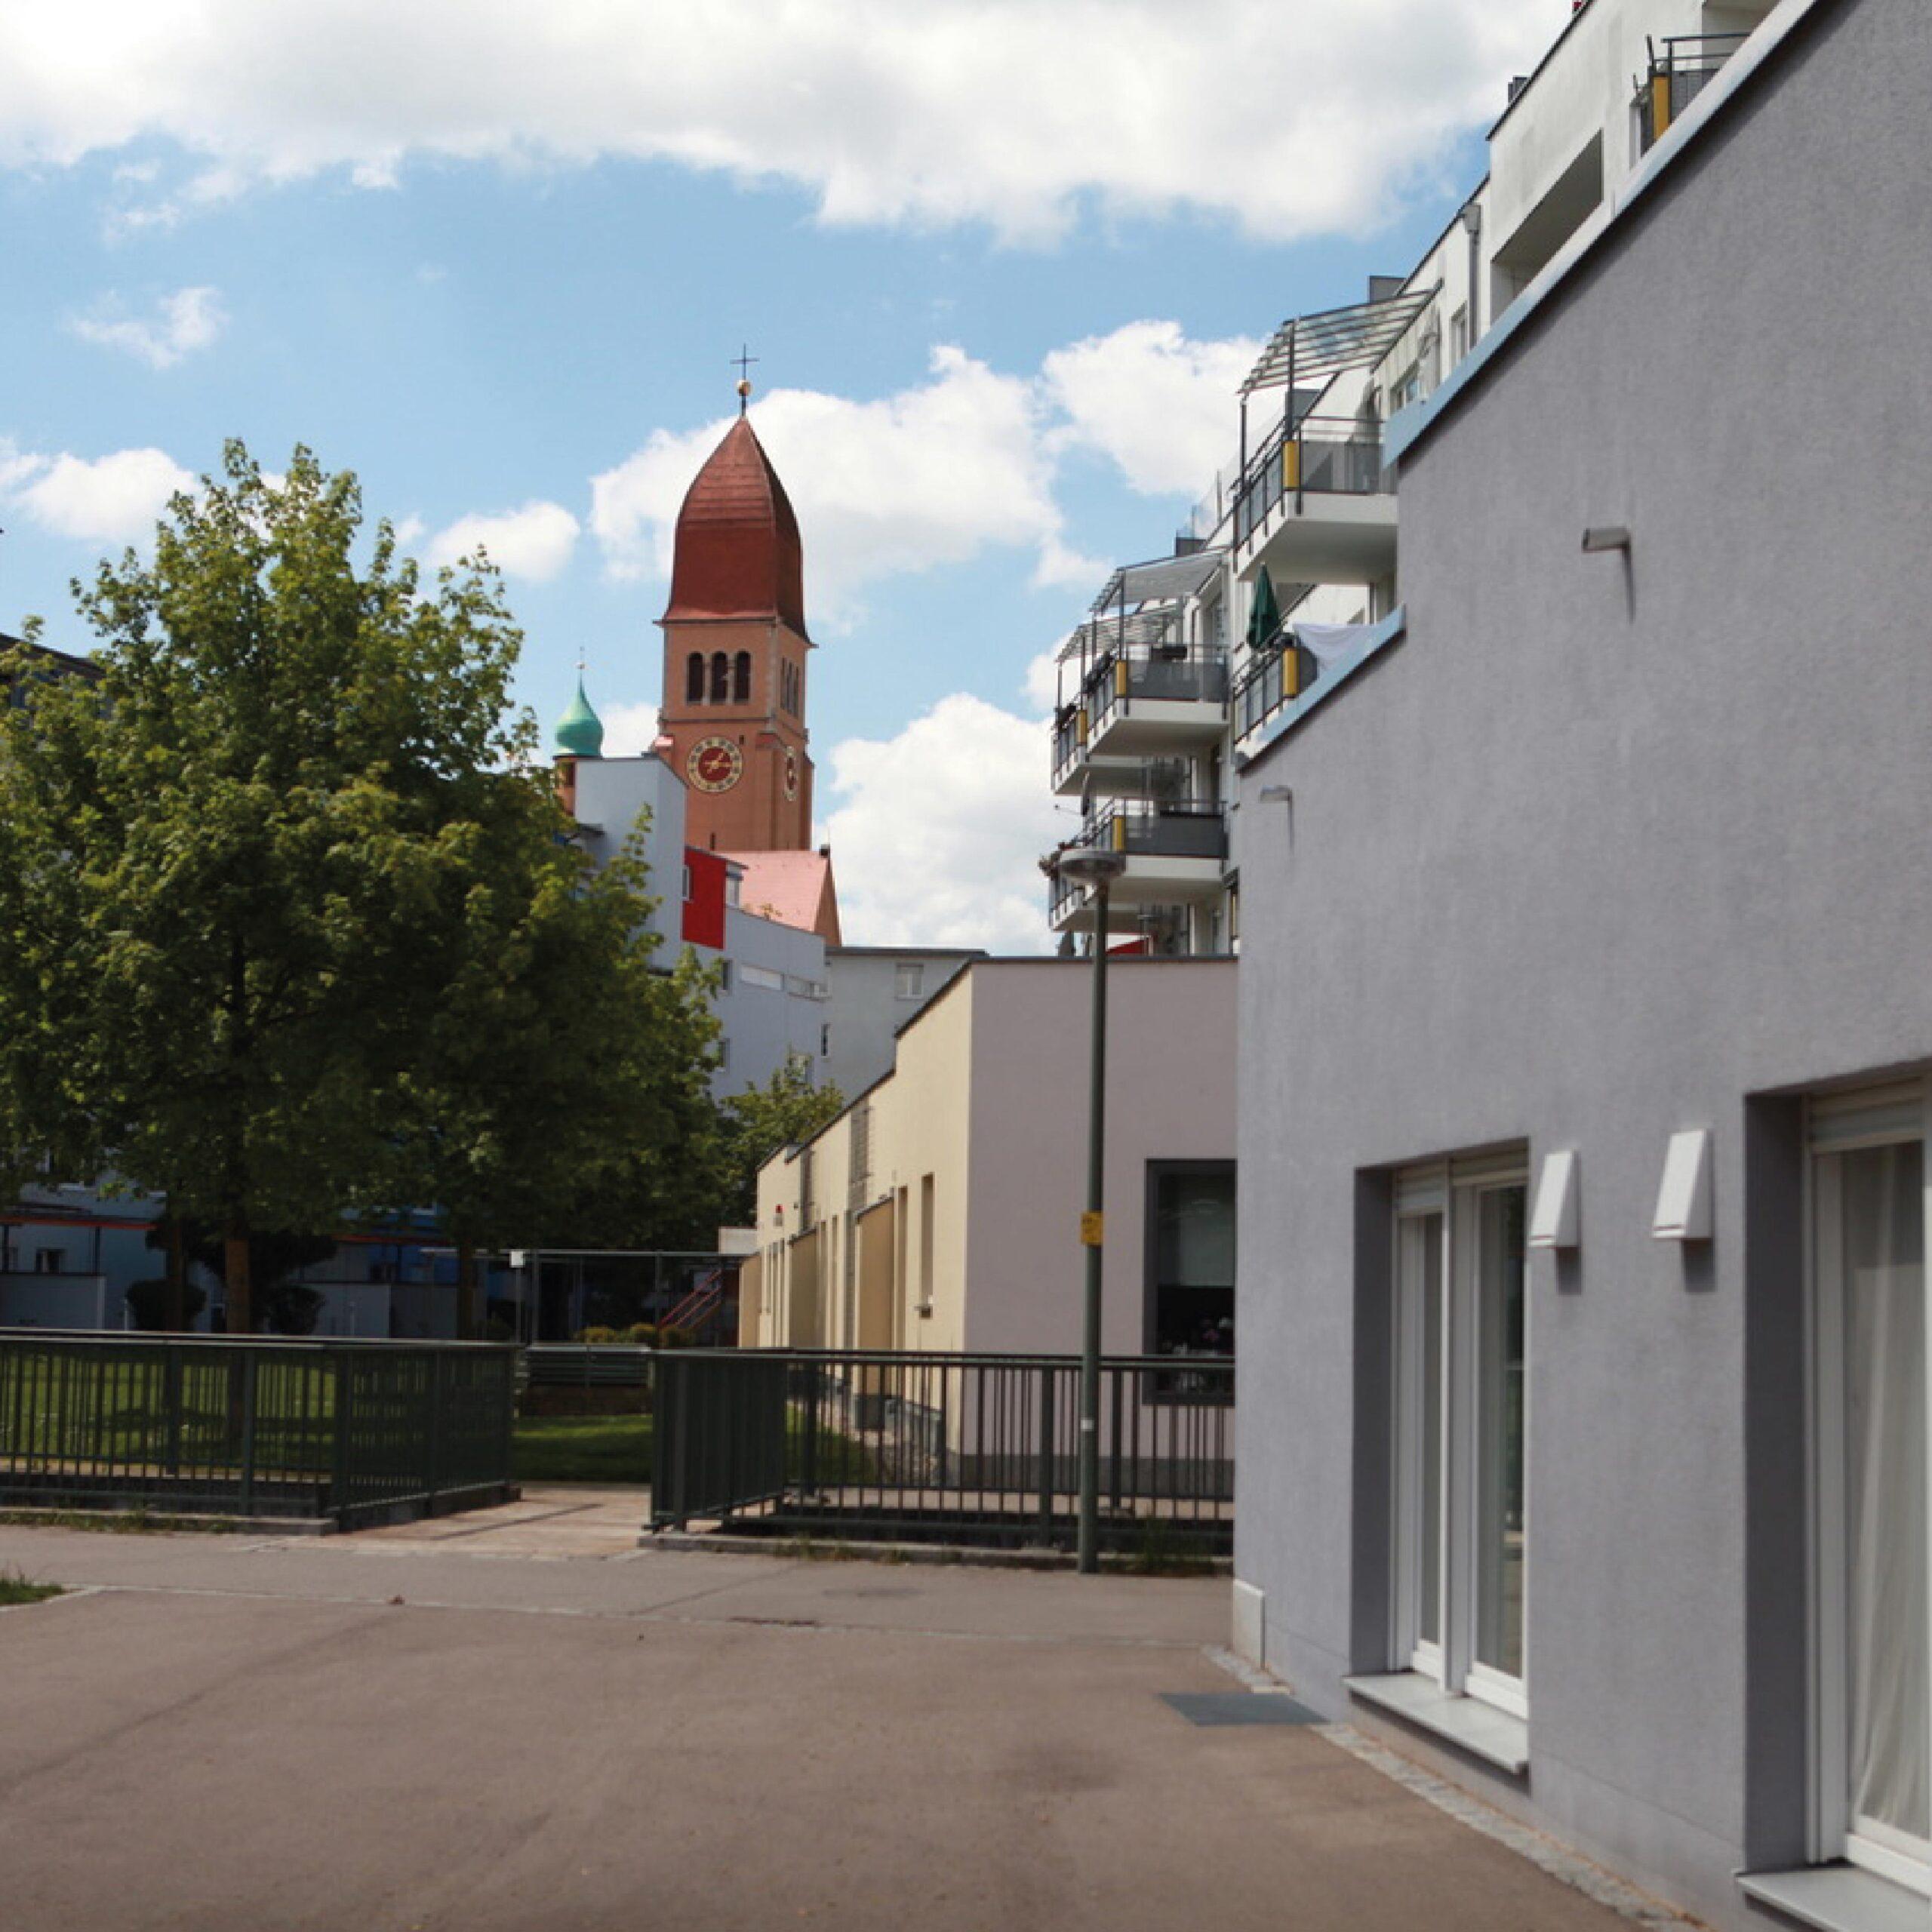 Kachel WG Augsburg